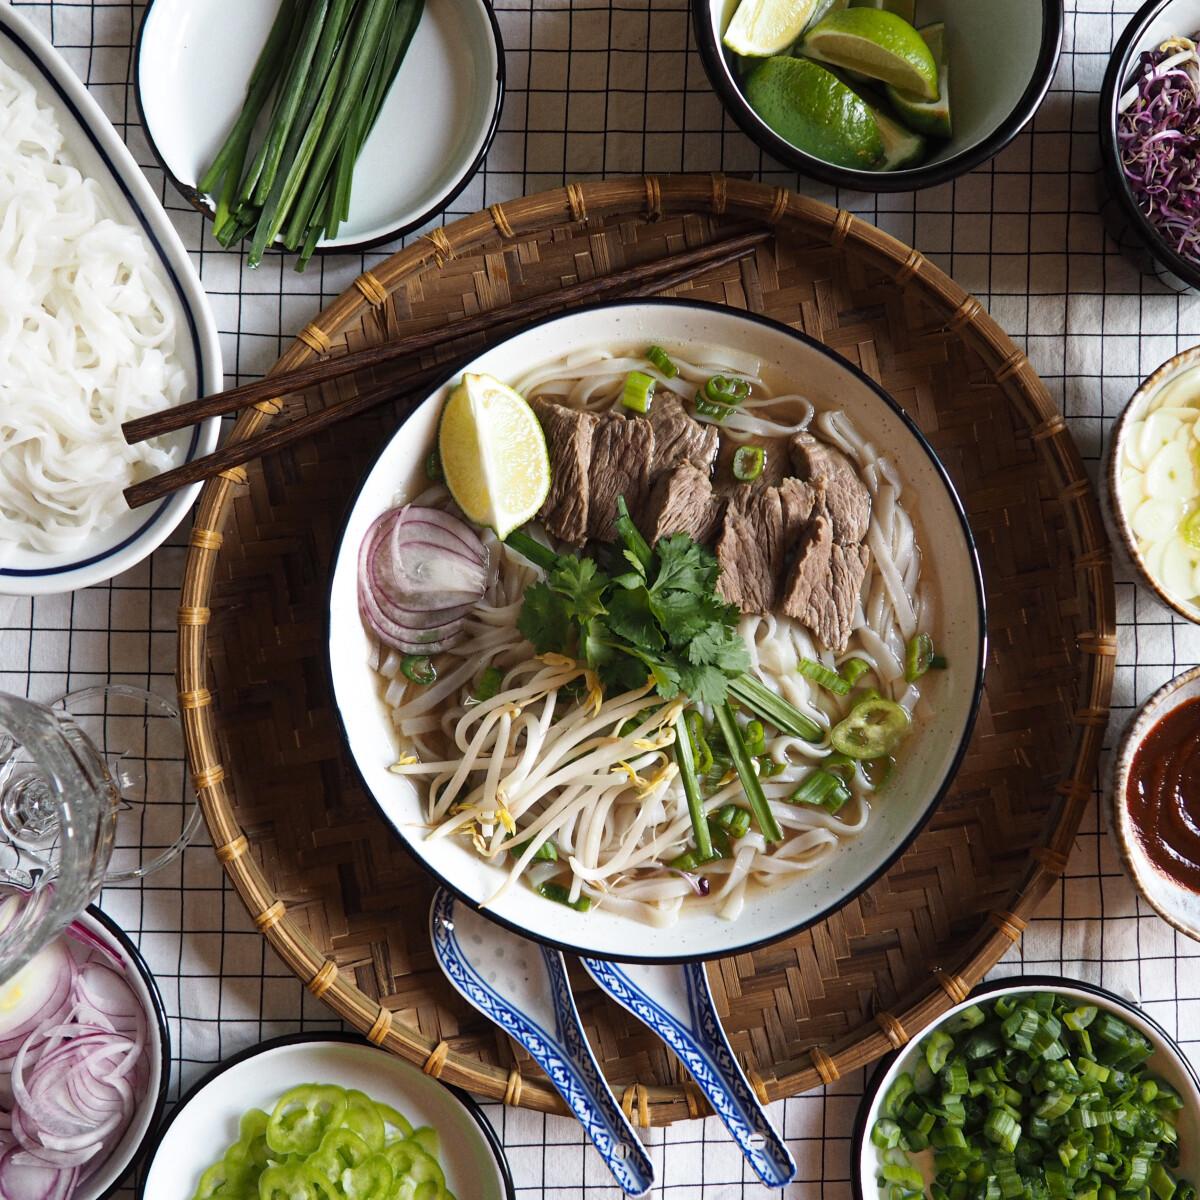 Phở bò, avagy vietnami pho leves marhából